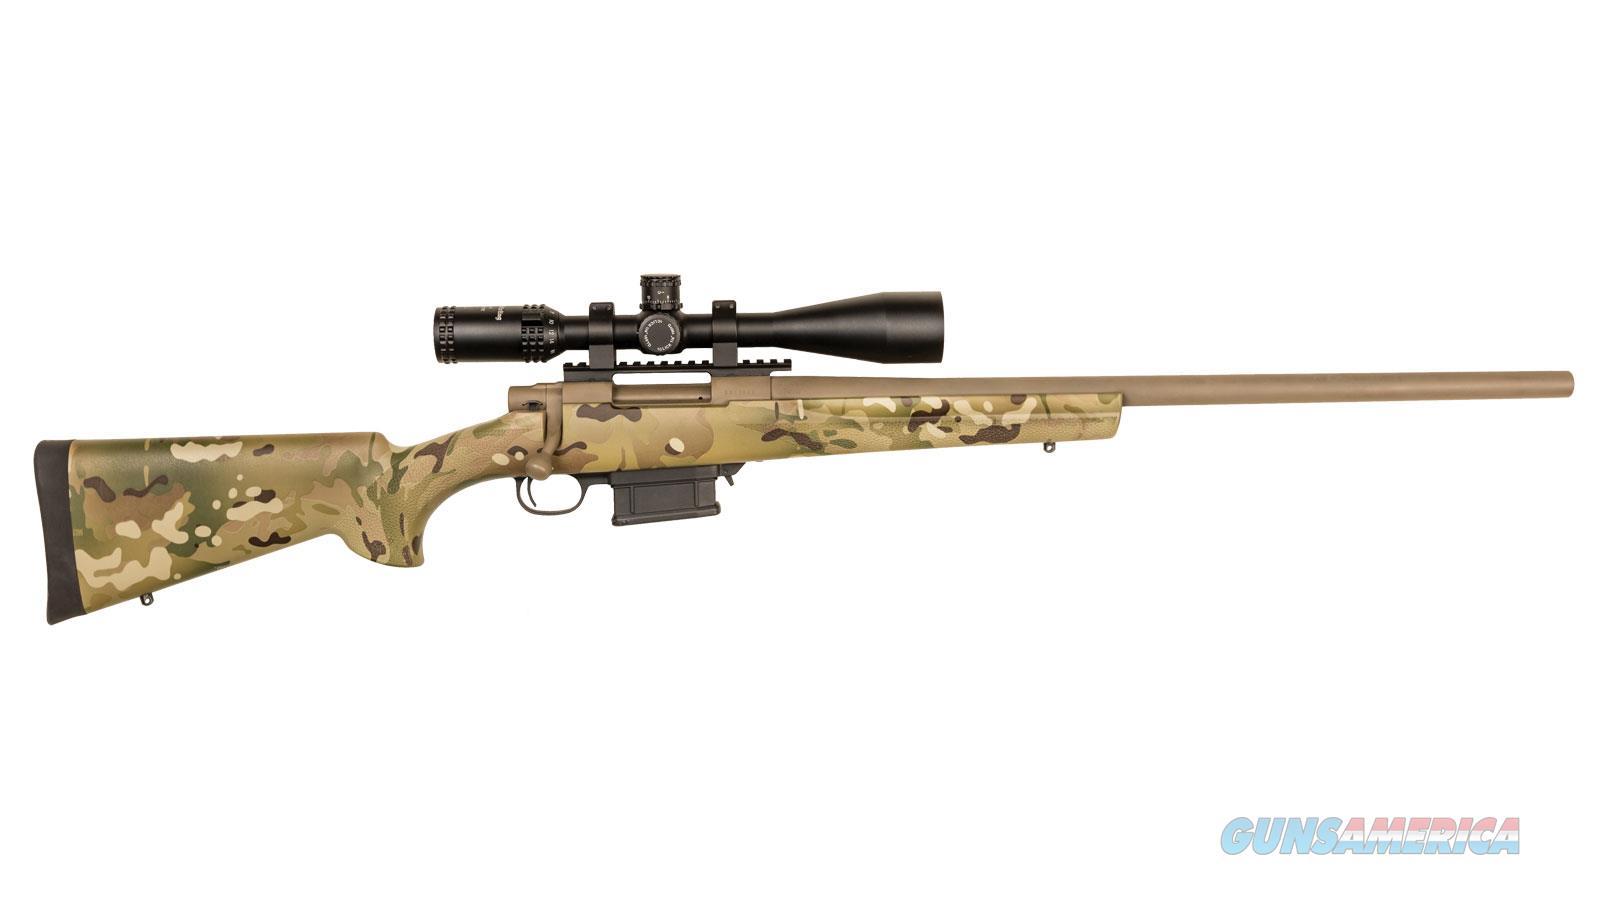 "Legacy Sports Tgt Mstr Pkg 308 24"" 5Rd HGT93147MCCFDE  Guns > Rifles > L Misc Rifles"